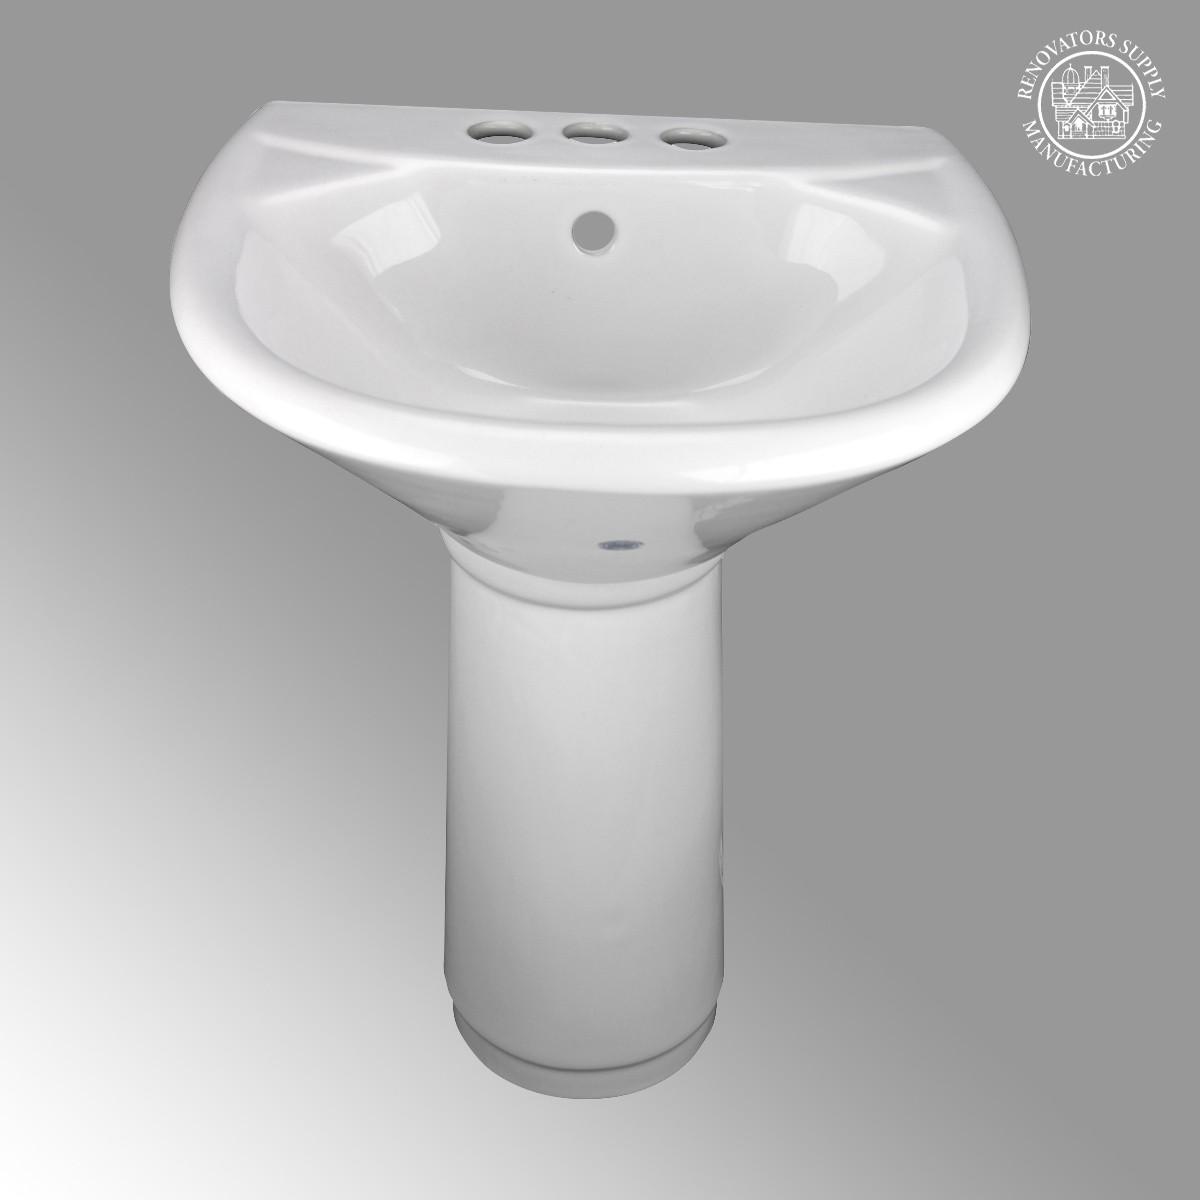 Children S Pedestal Sink Kids Wash Station White China